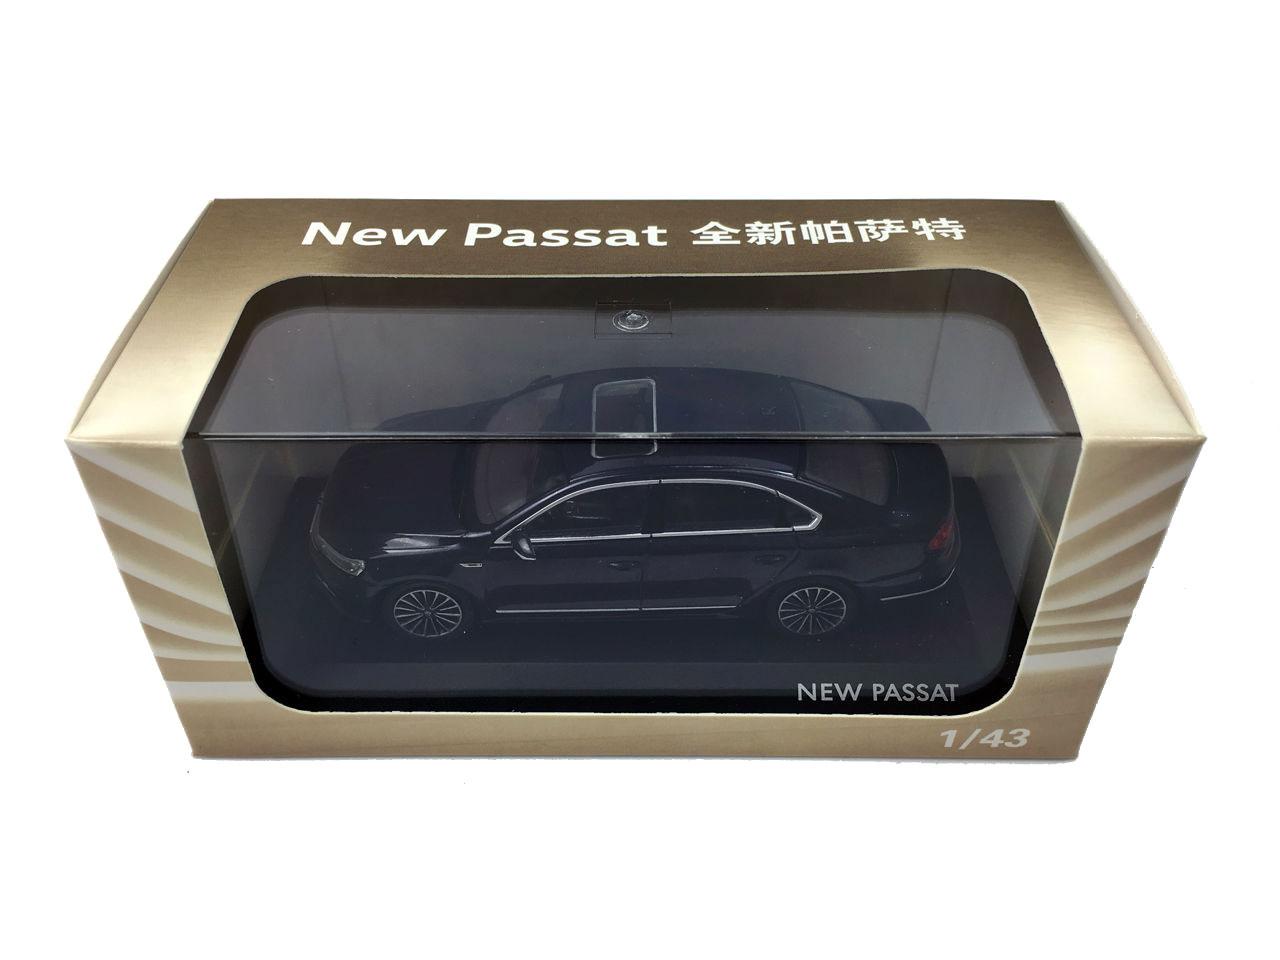 Volkswagen Passat GP 1/43 Scale Die-cast Model Car Wholesale 6